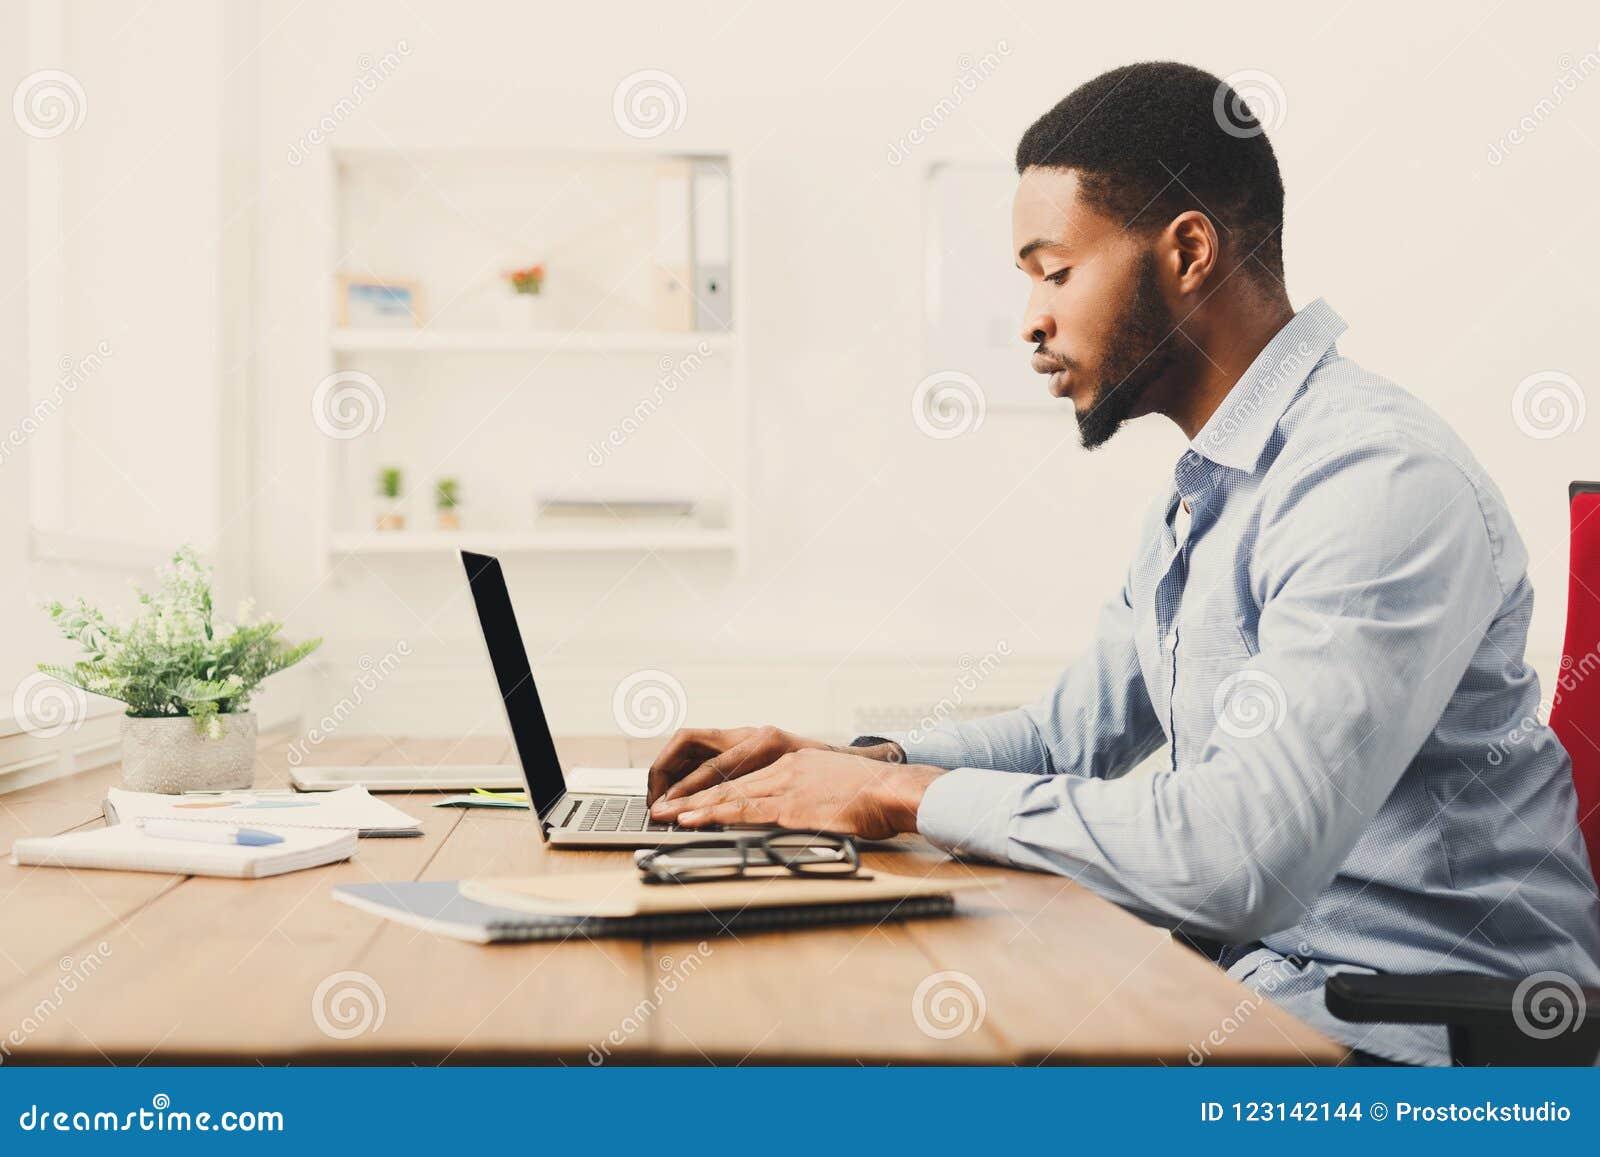 Młody czarny biznesmen pracuje z laptopem